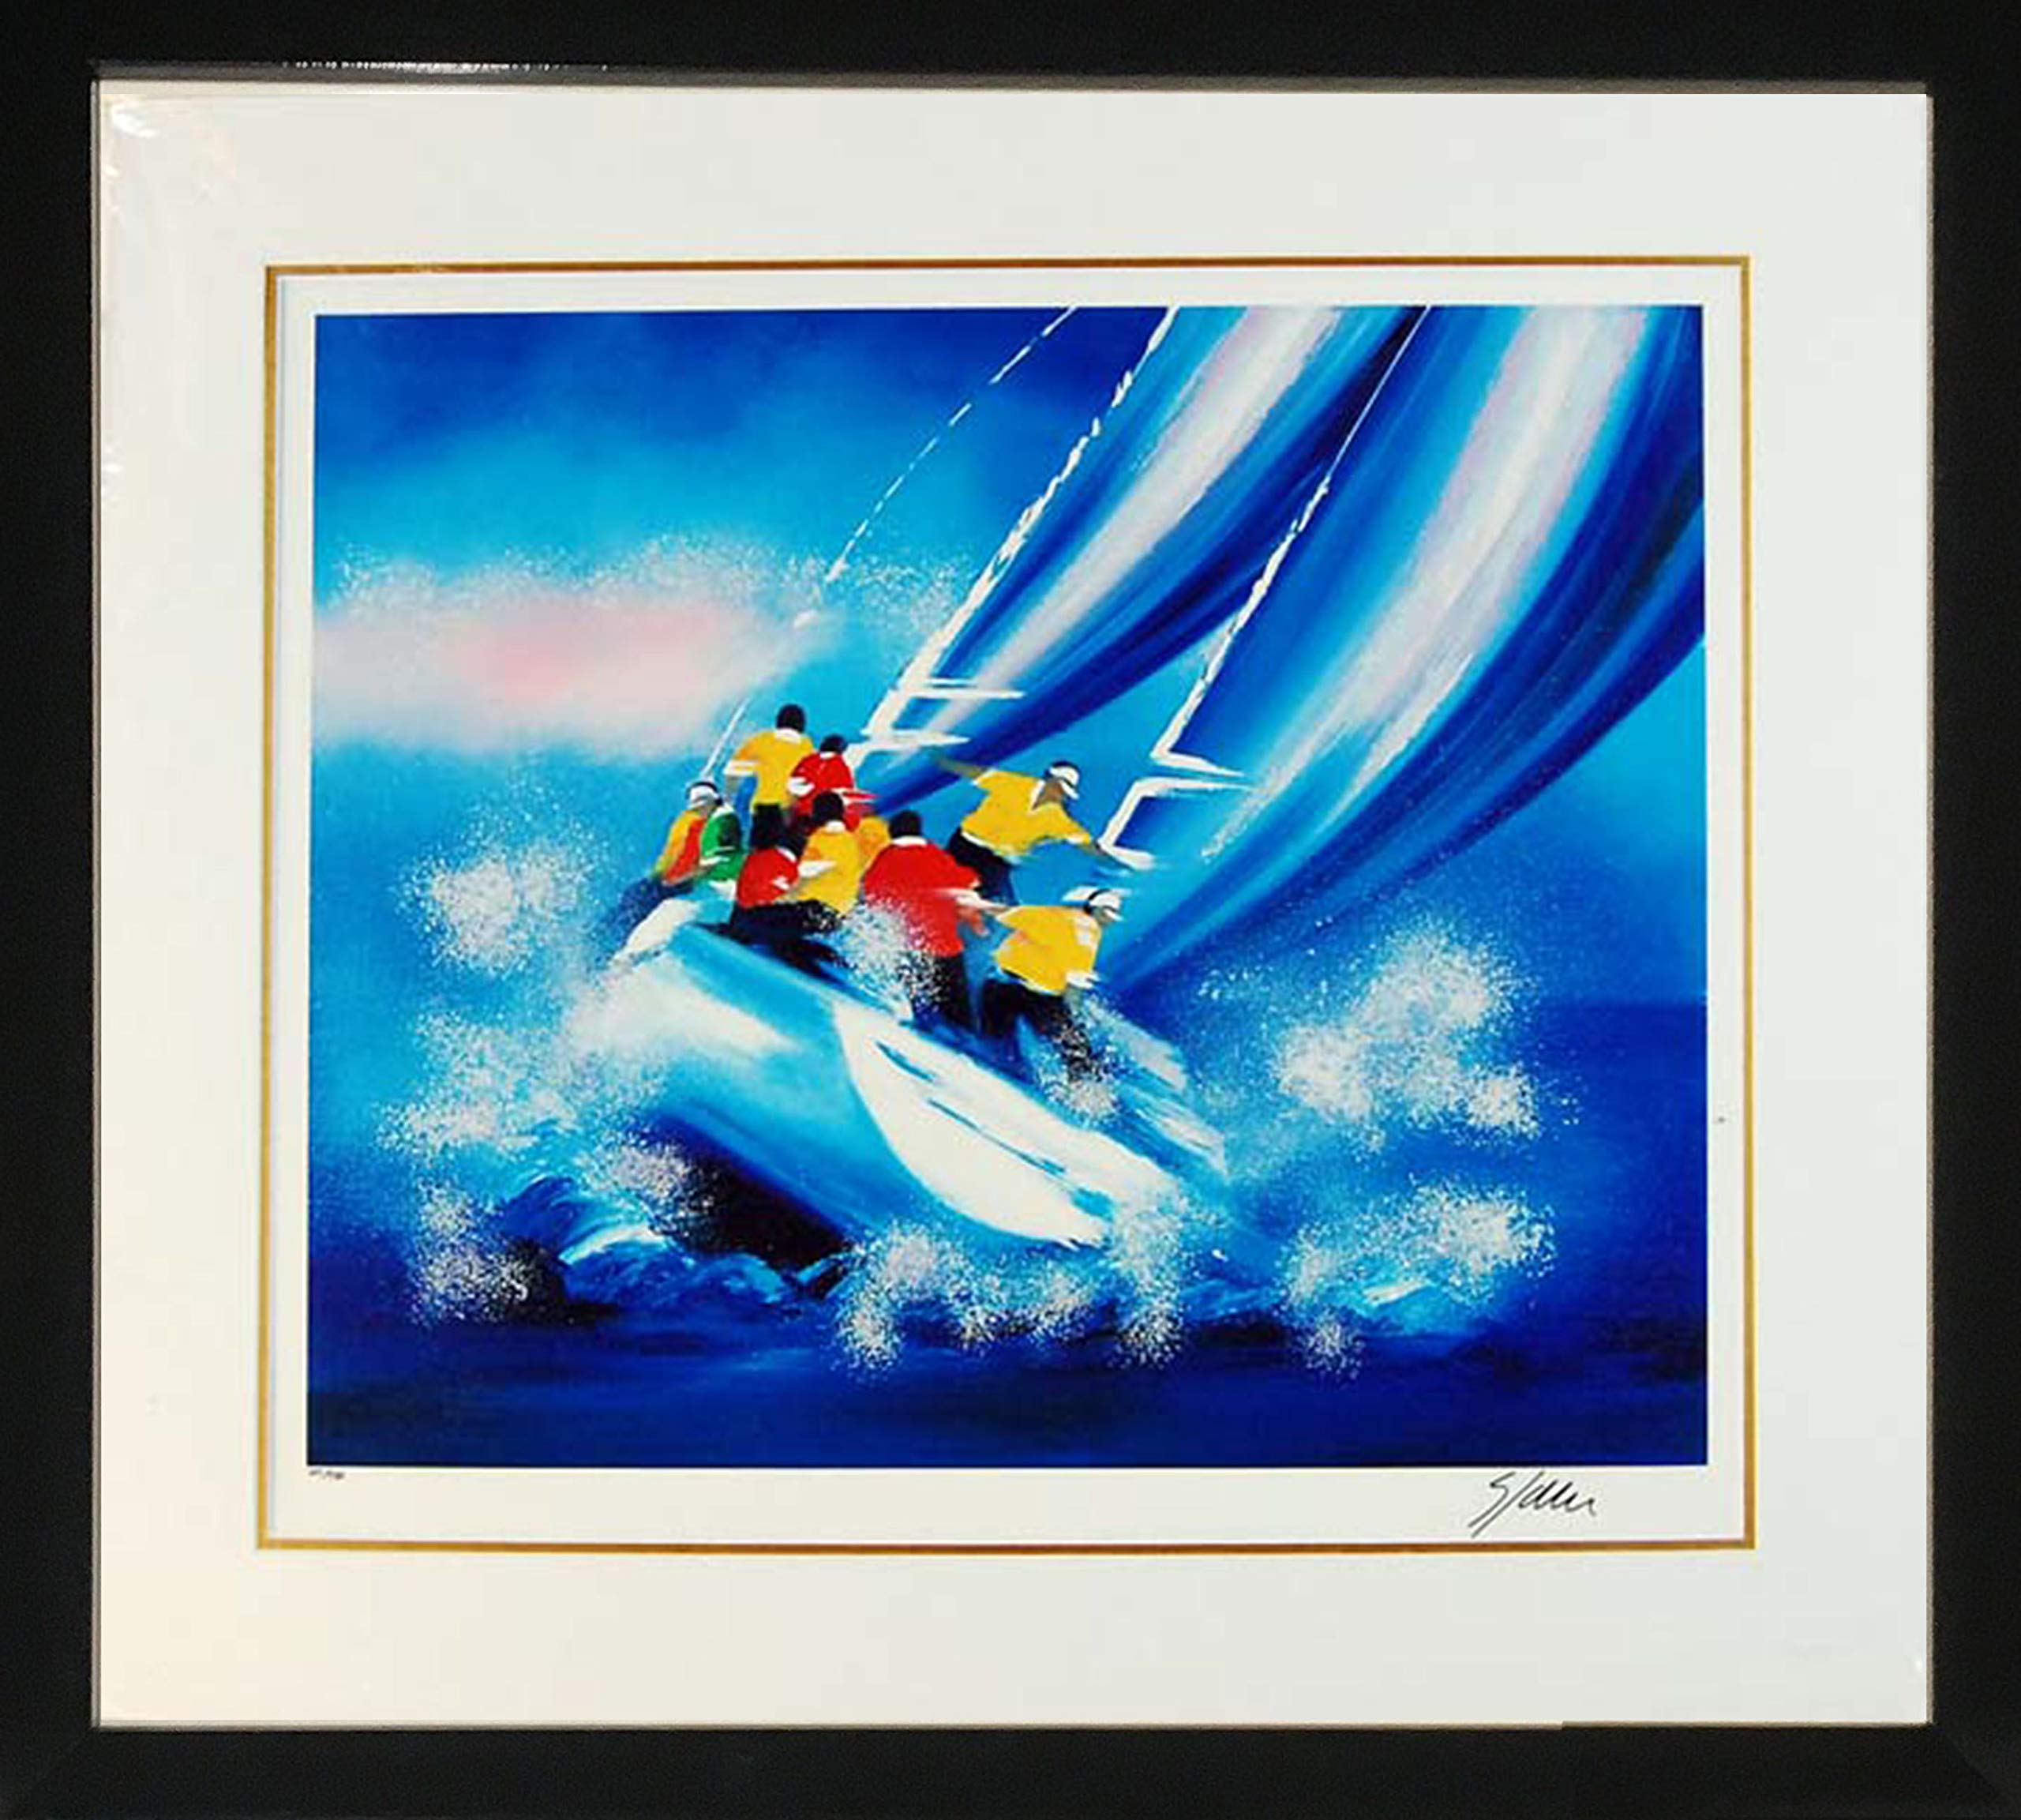 Framed Art''Fullspeed'' by Victor Spahn by